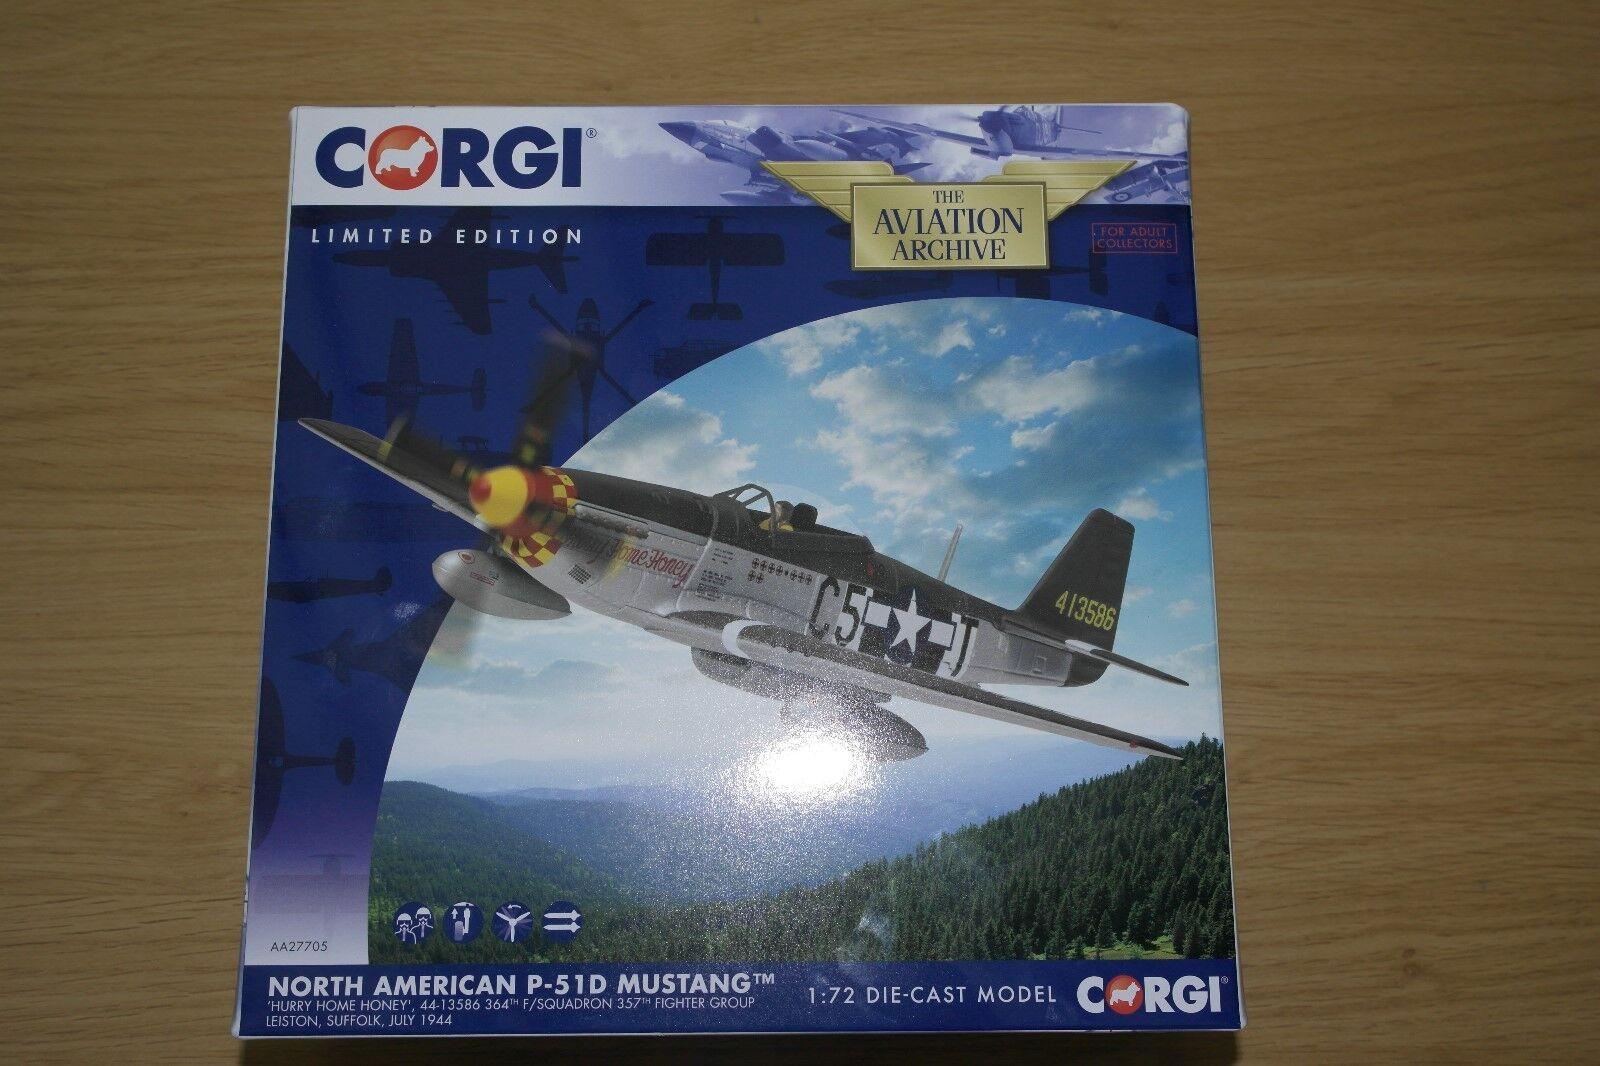 Corgi aviation 1 72 nordamerikanischen p-51d mustang nach hause, schatz 364f 357f   g   s